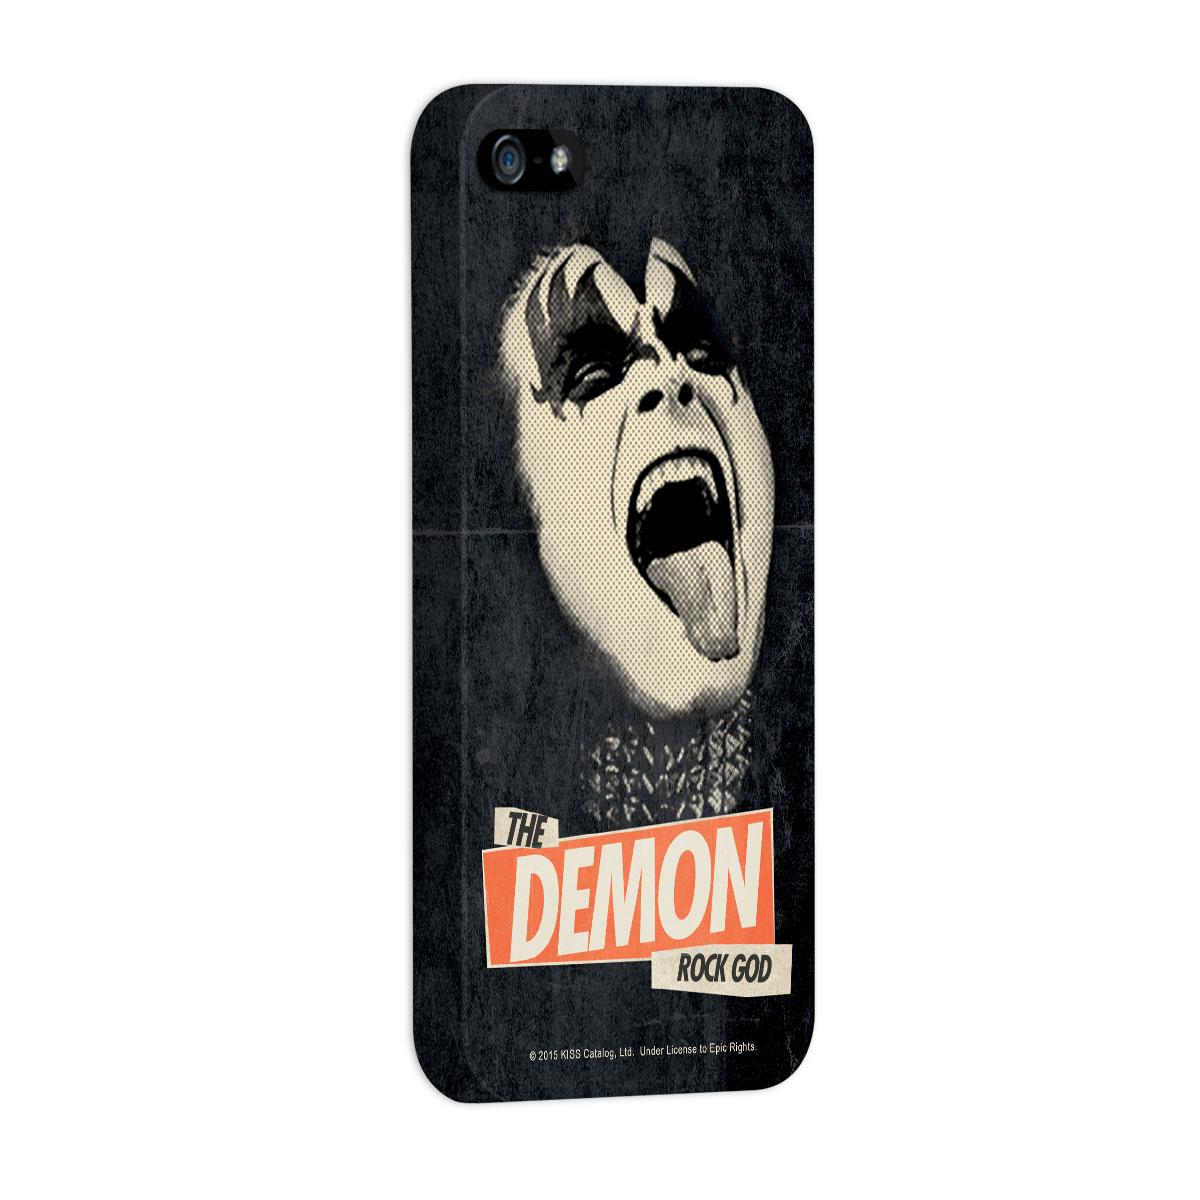 Capa para iPhone 5/5S Kiss Rock God